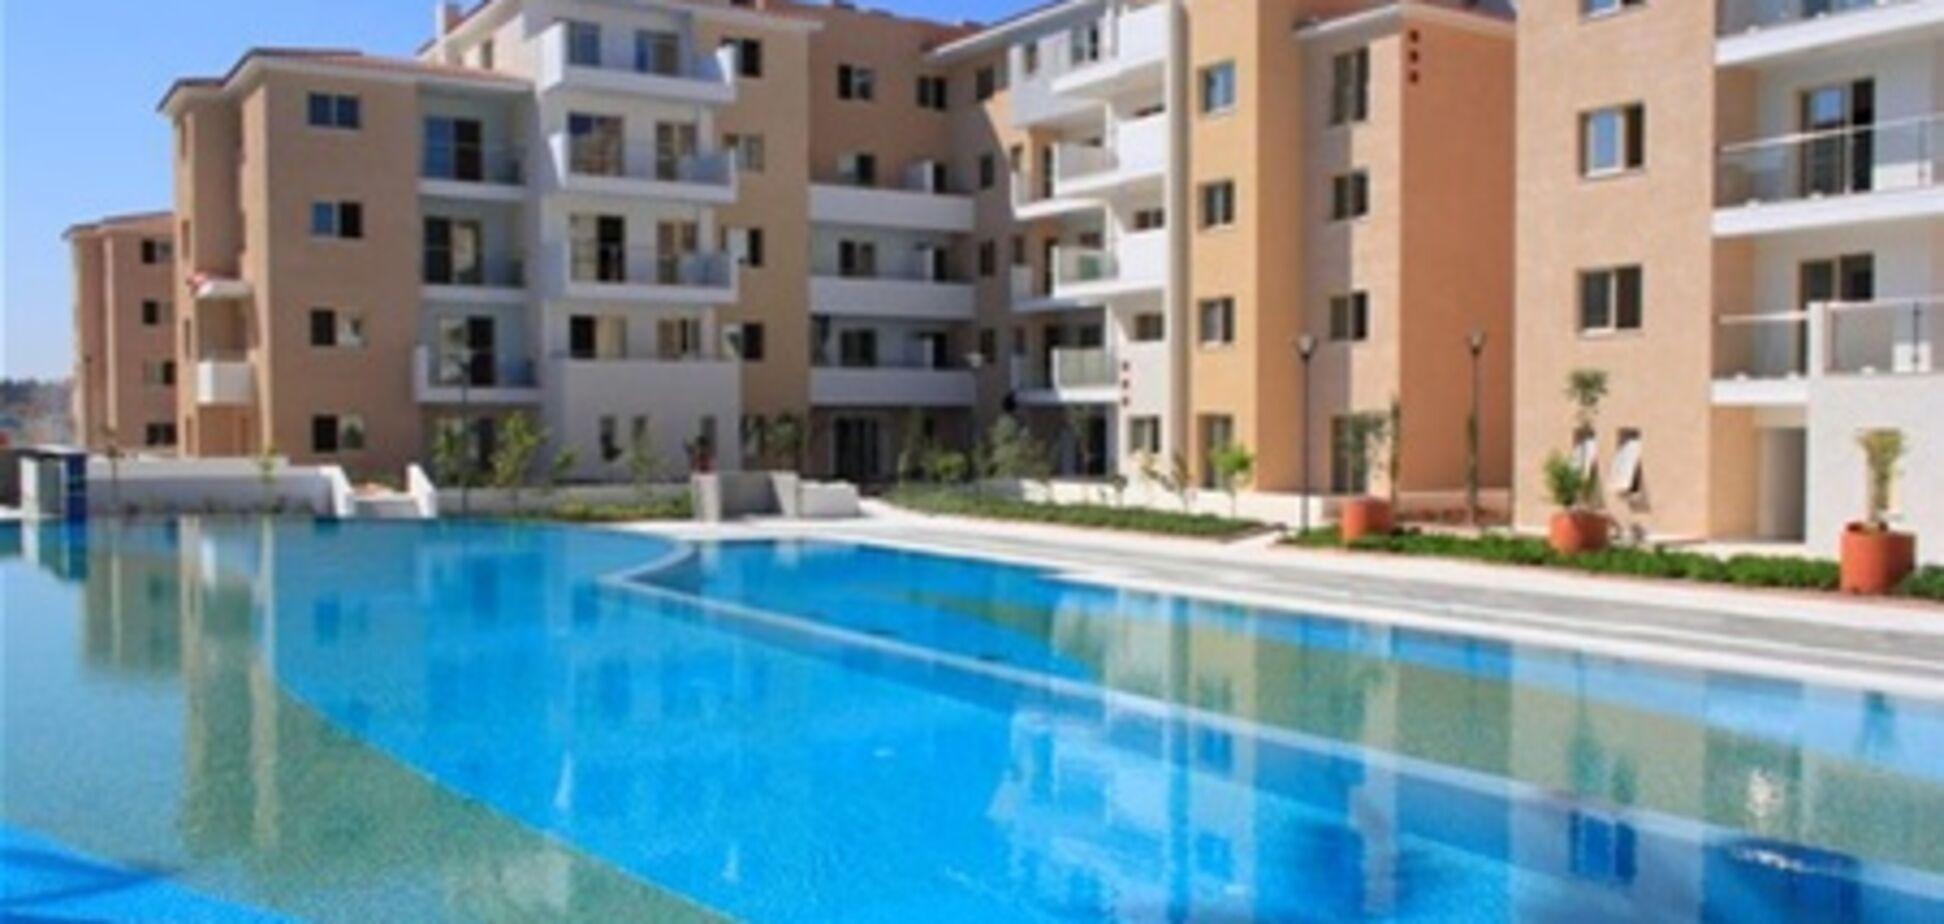 Продажи недвижимости на Кипре достигли исторического минимума